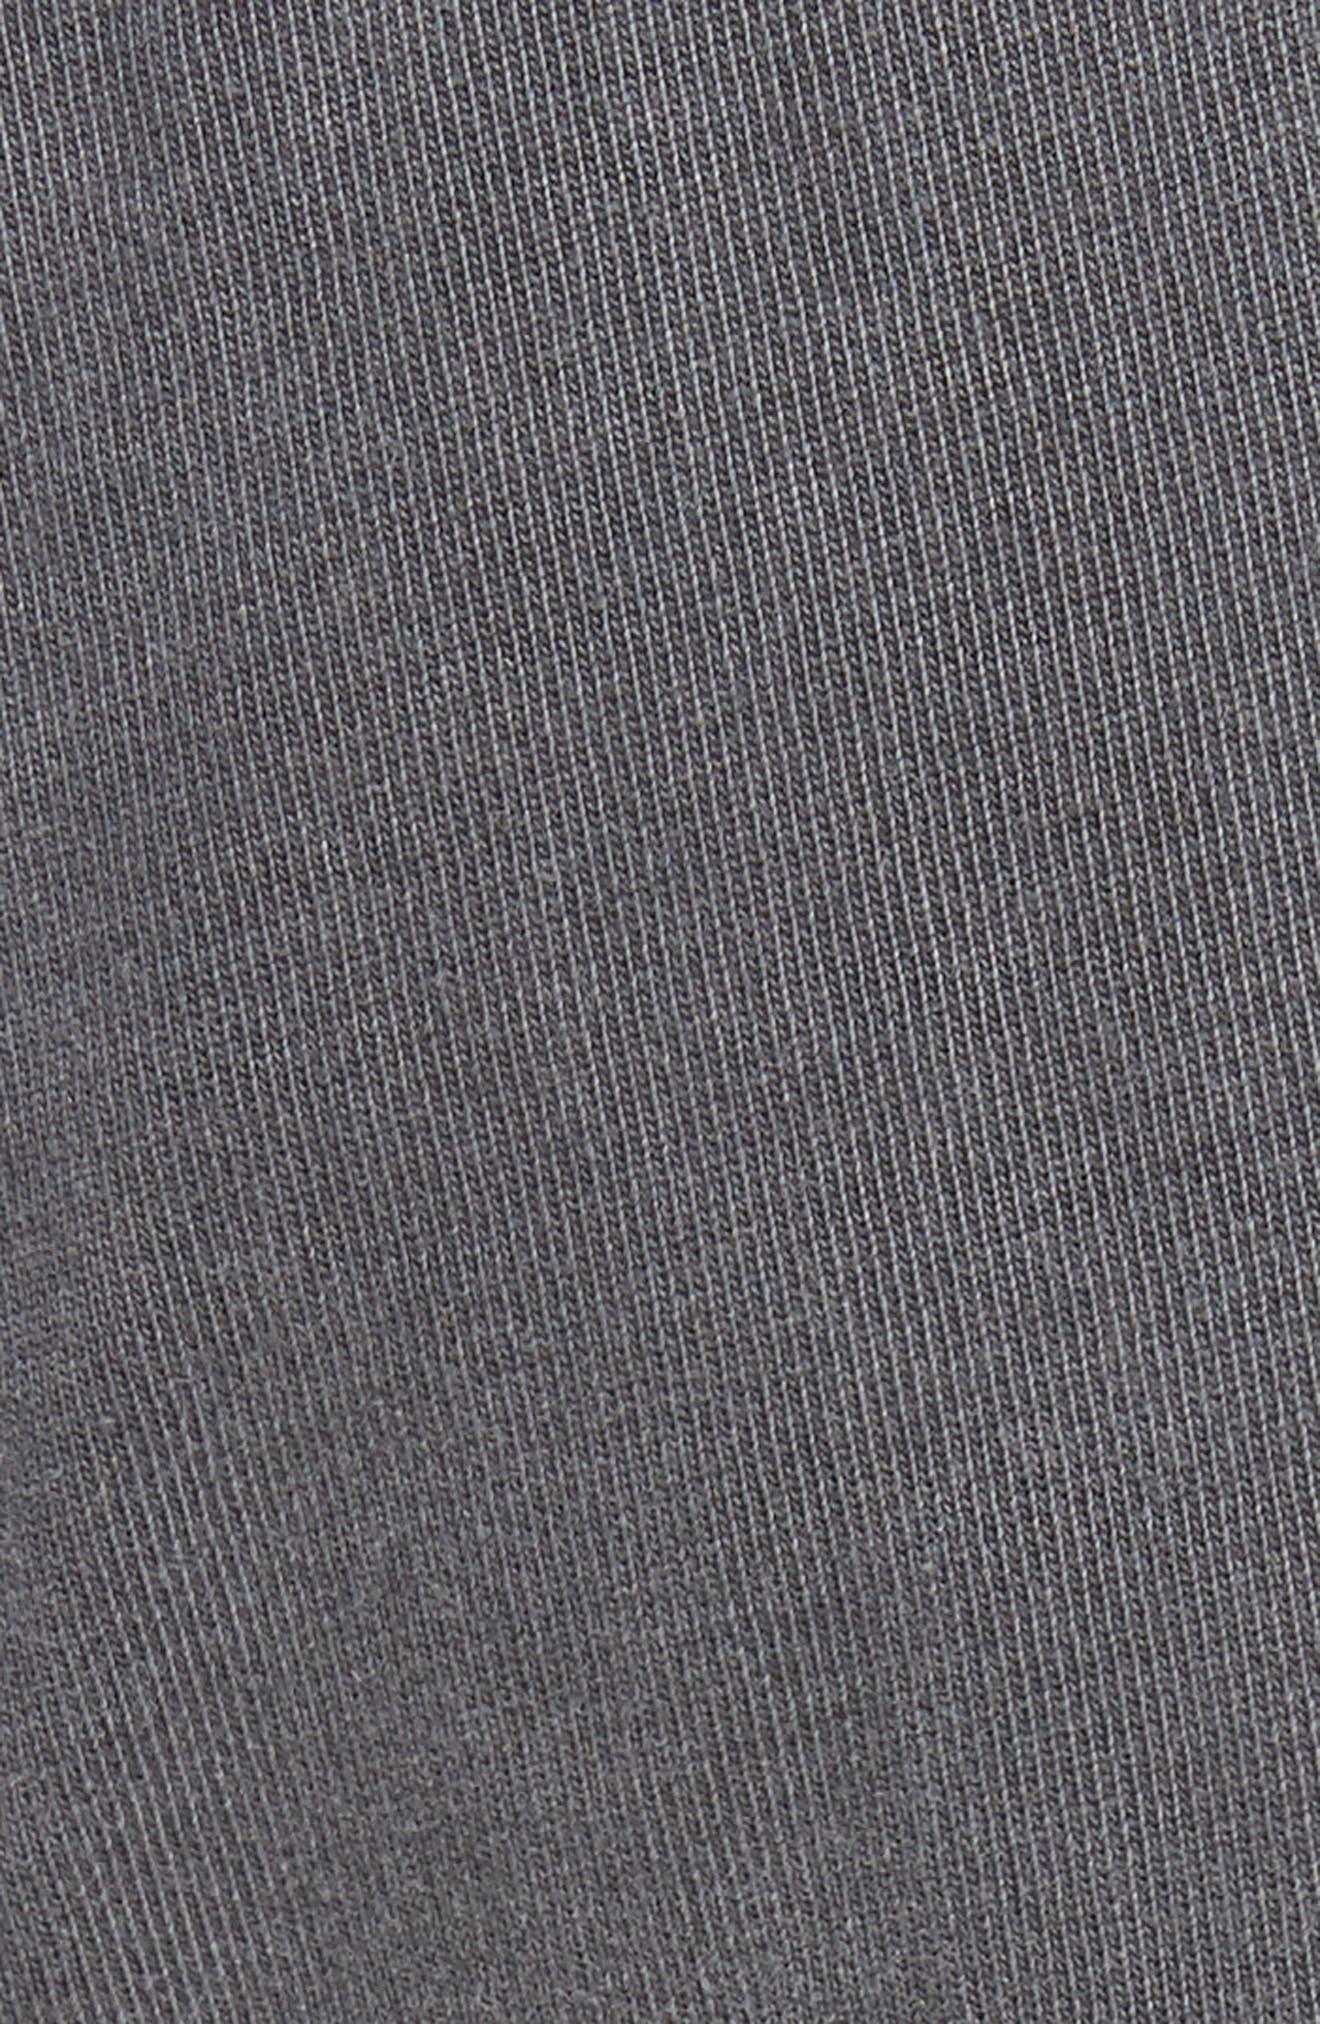 Geri Cropped Jogger Cargo Pants,                             Alternate thumbnail 5, color,                             989